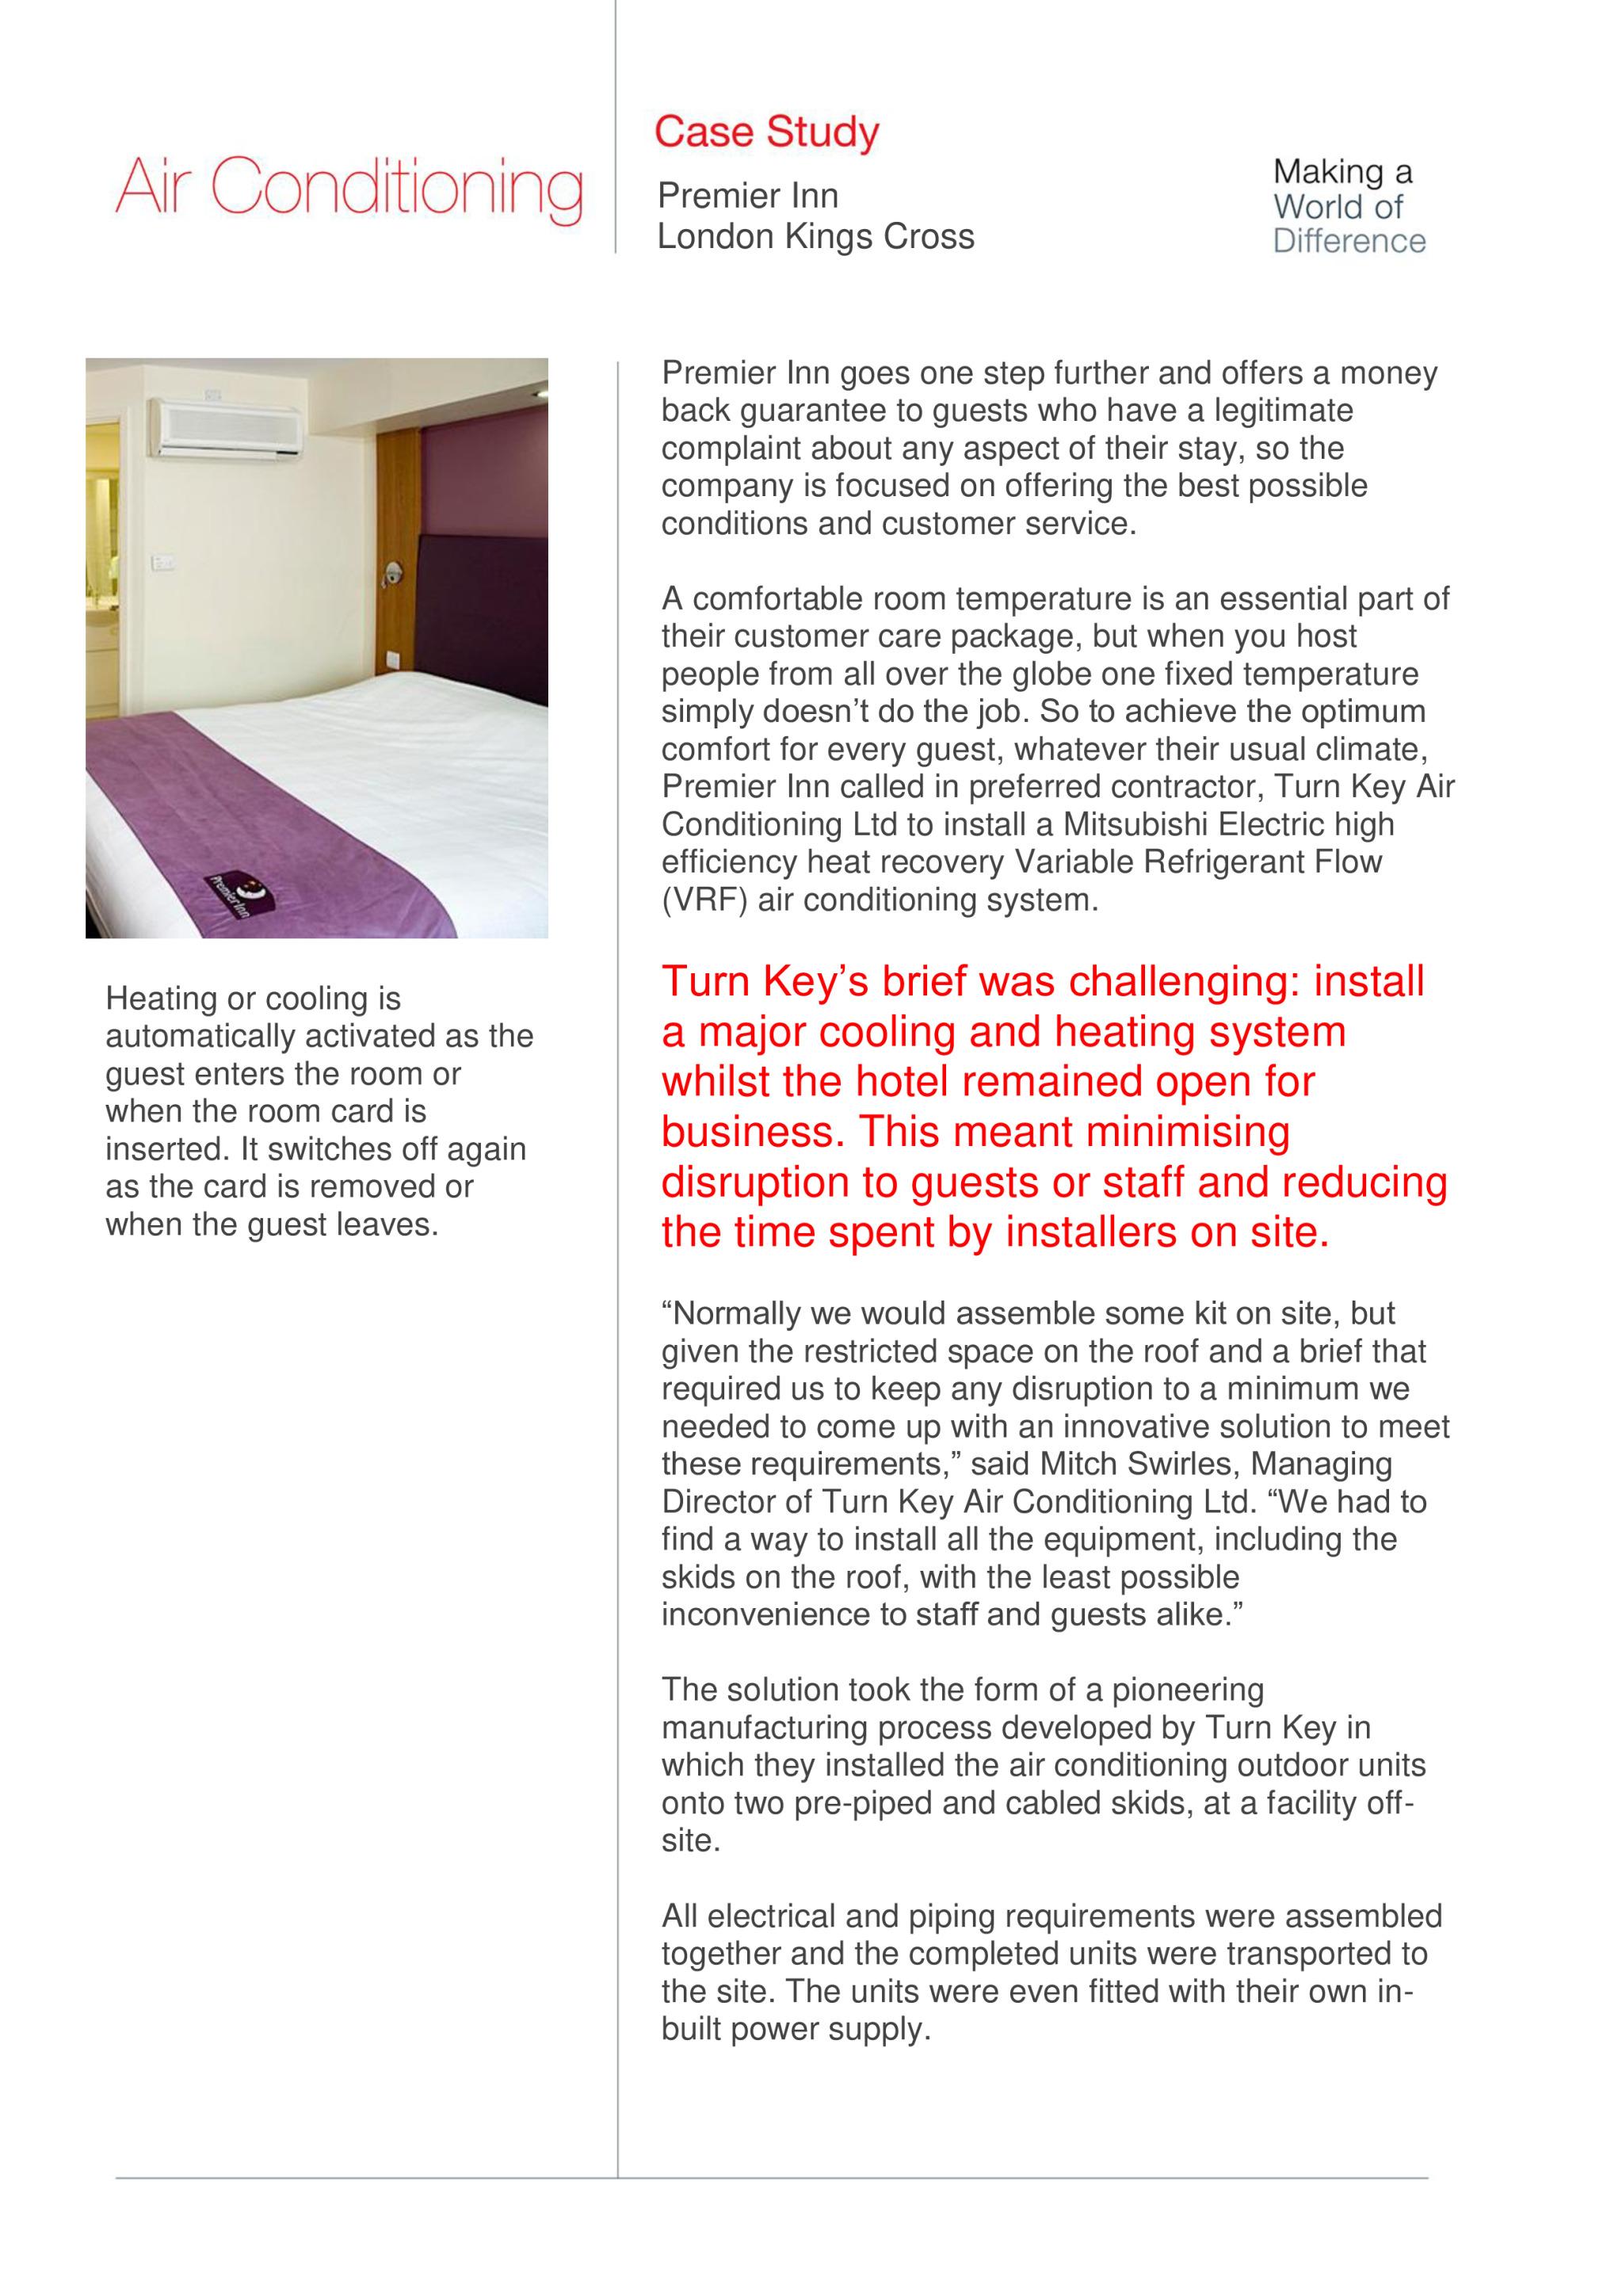 Premier Inn, City Multi VRF (R2 Series), London - Mitsubishi Electric